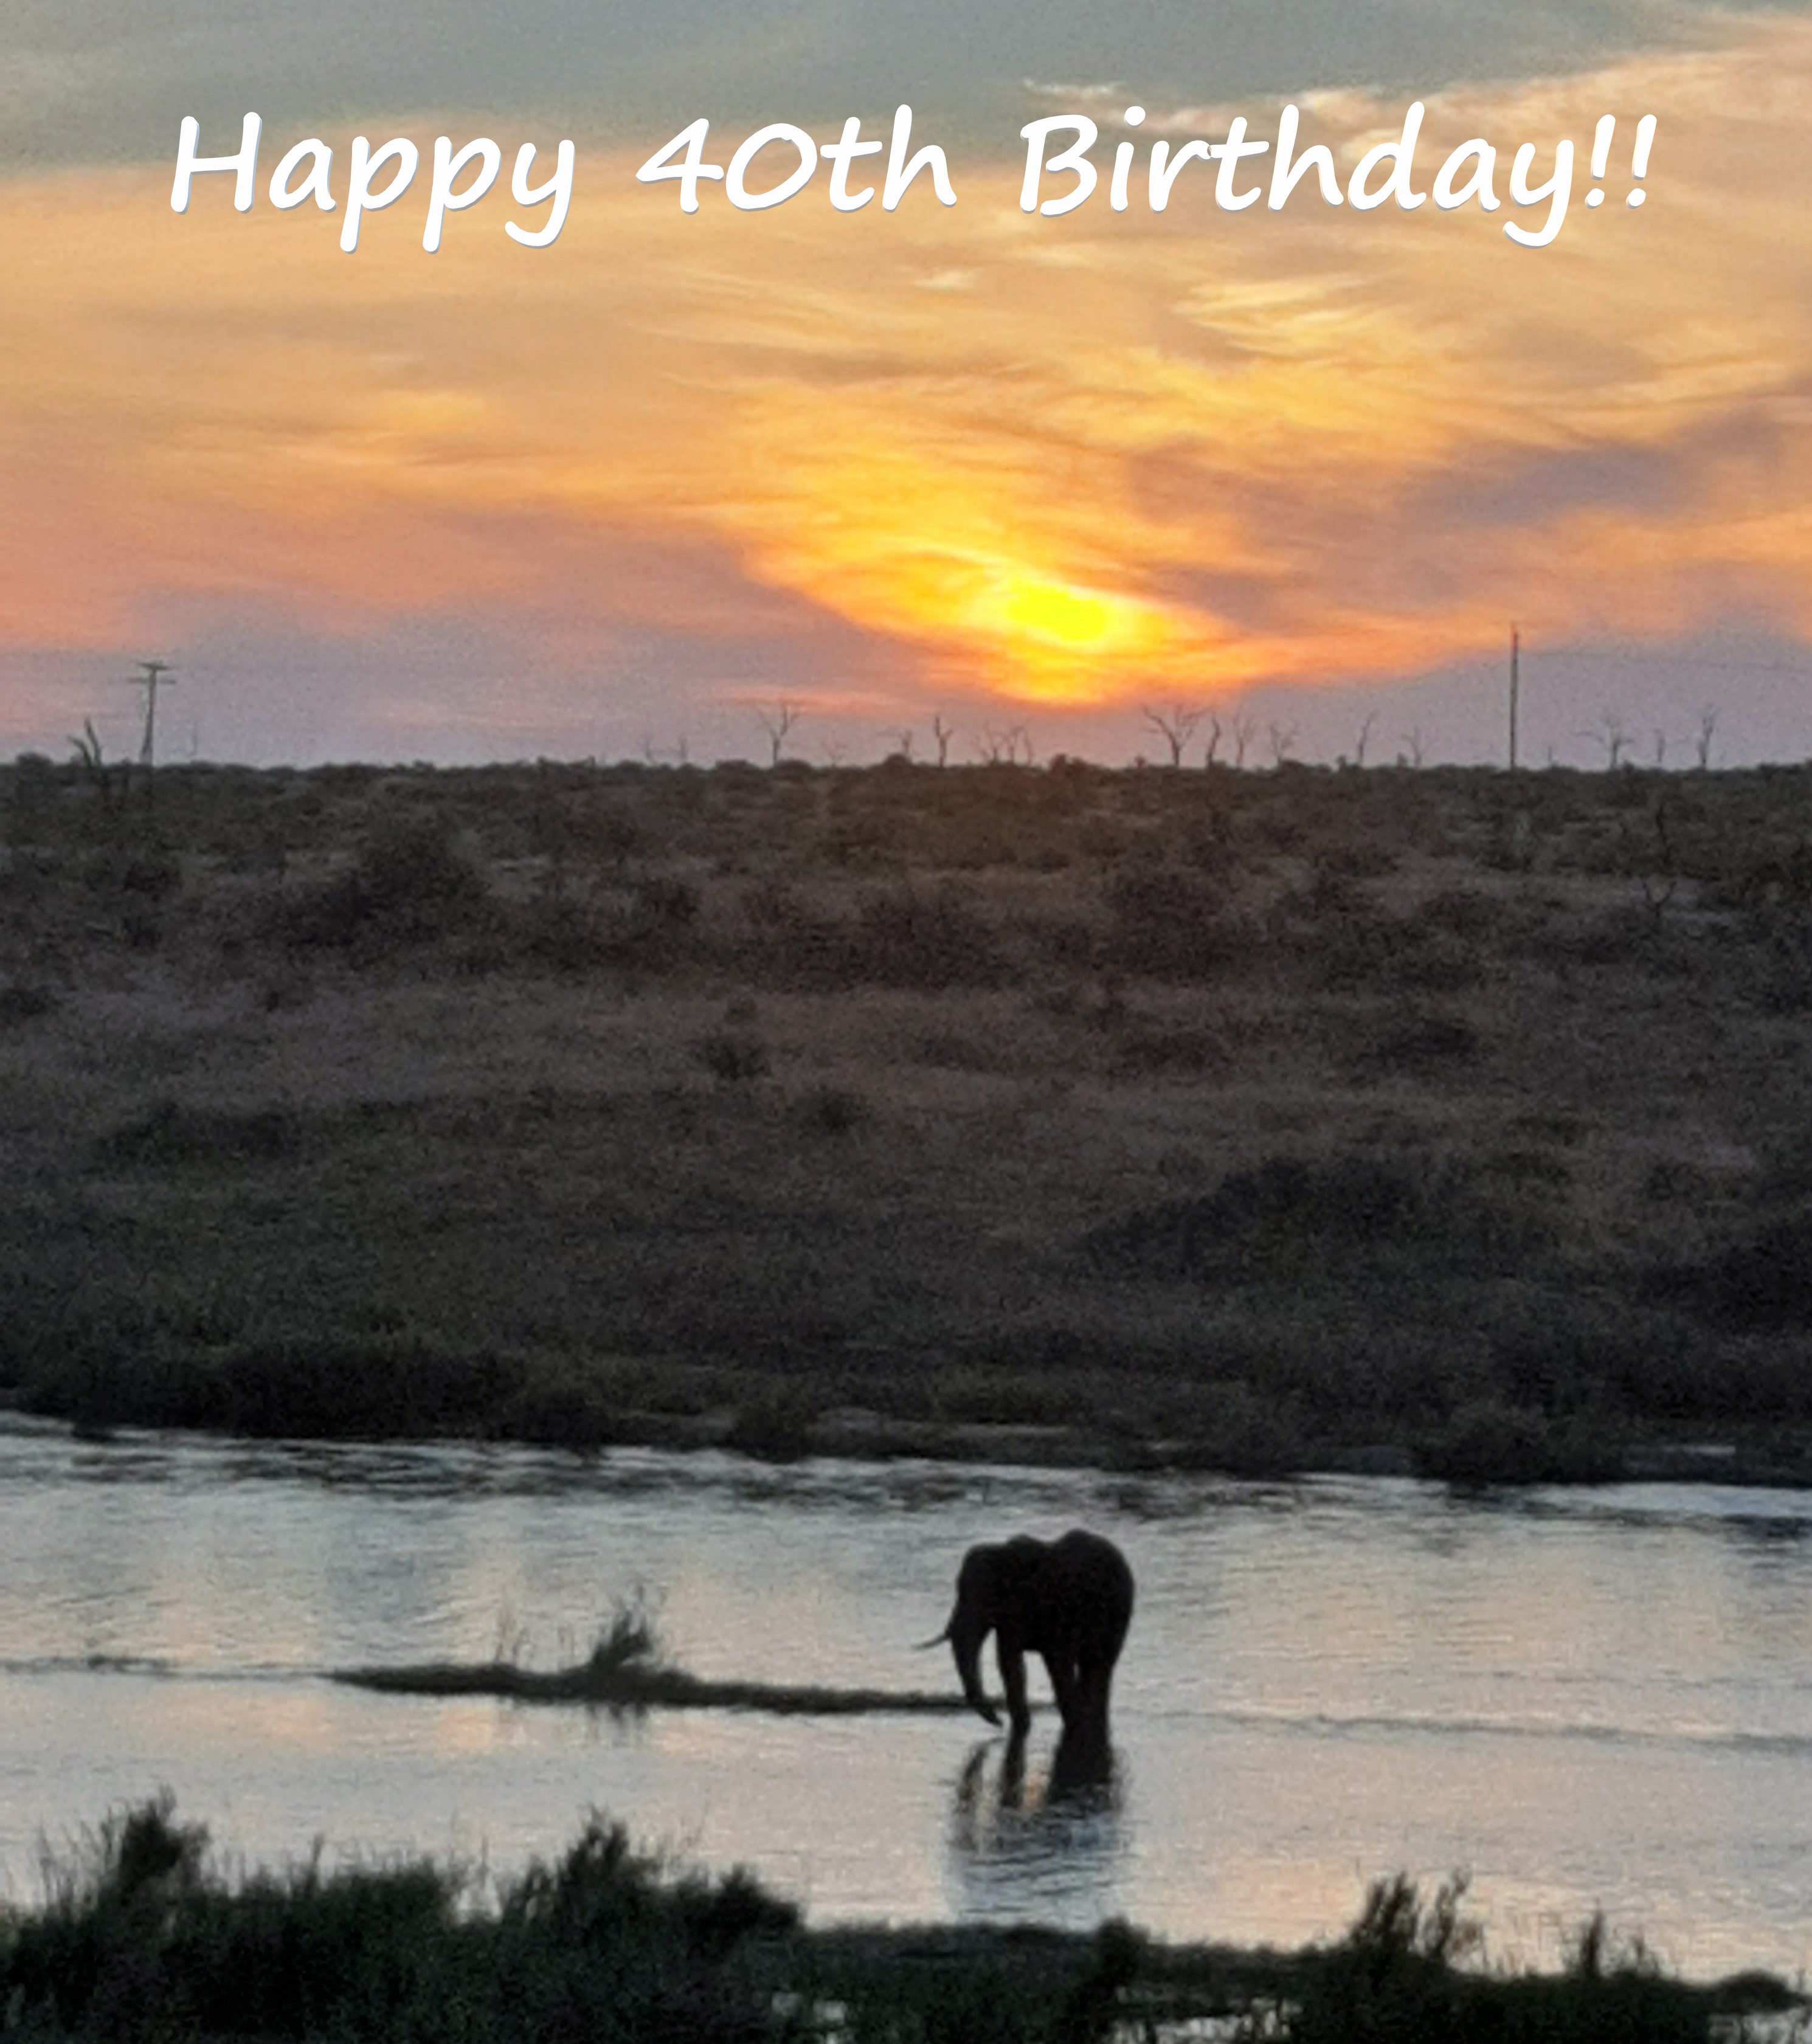 Happy-Birthday-Sunset-Elephant